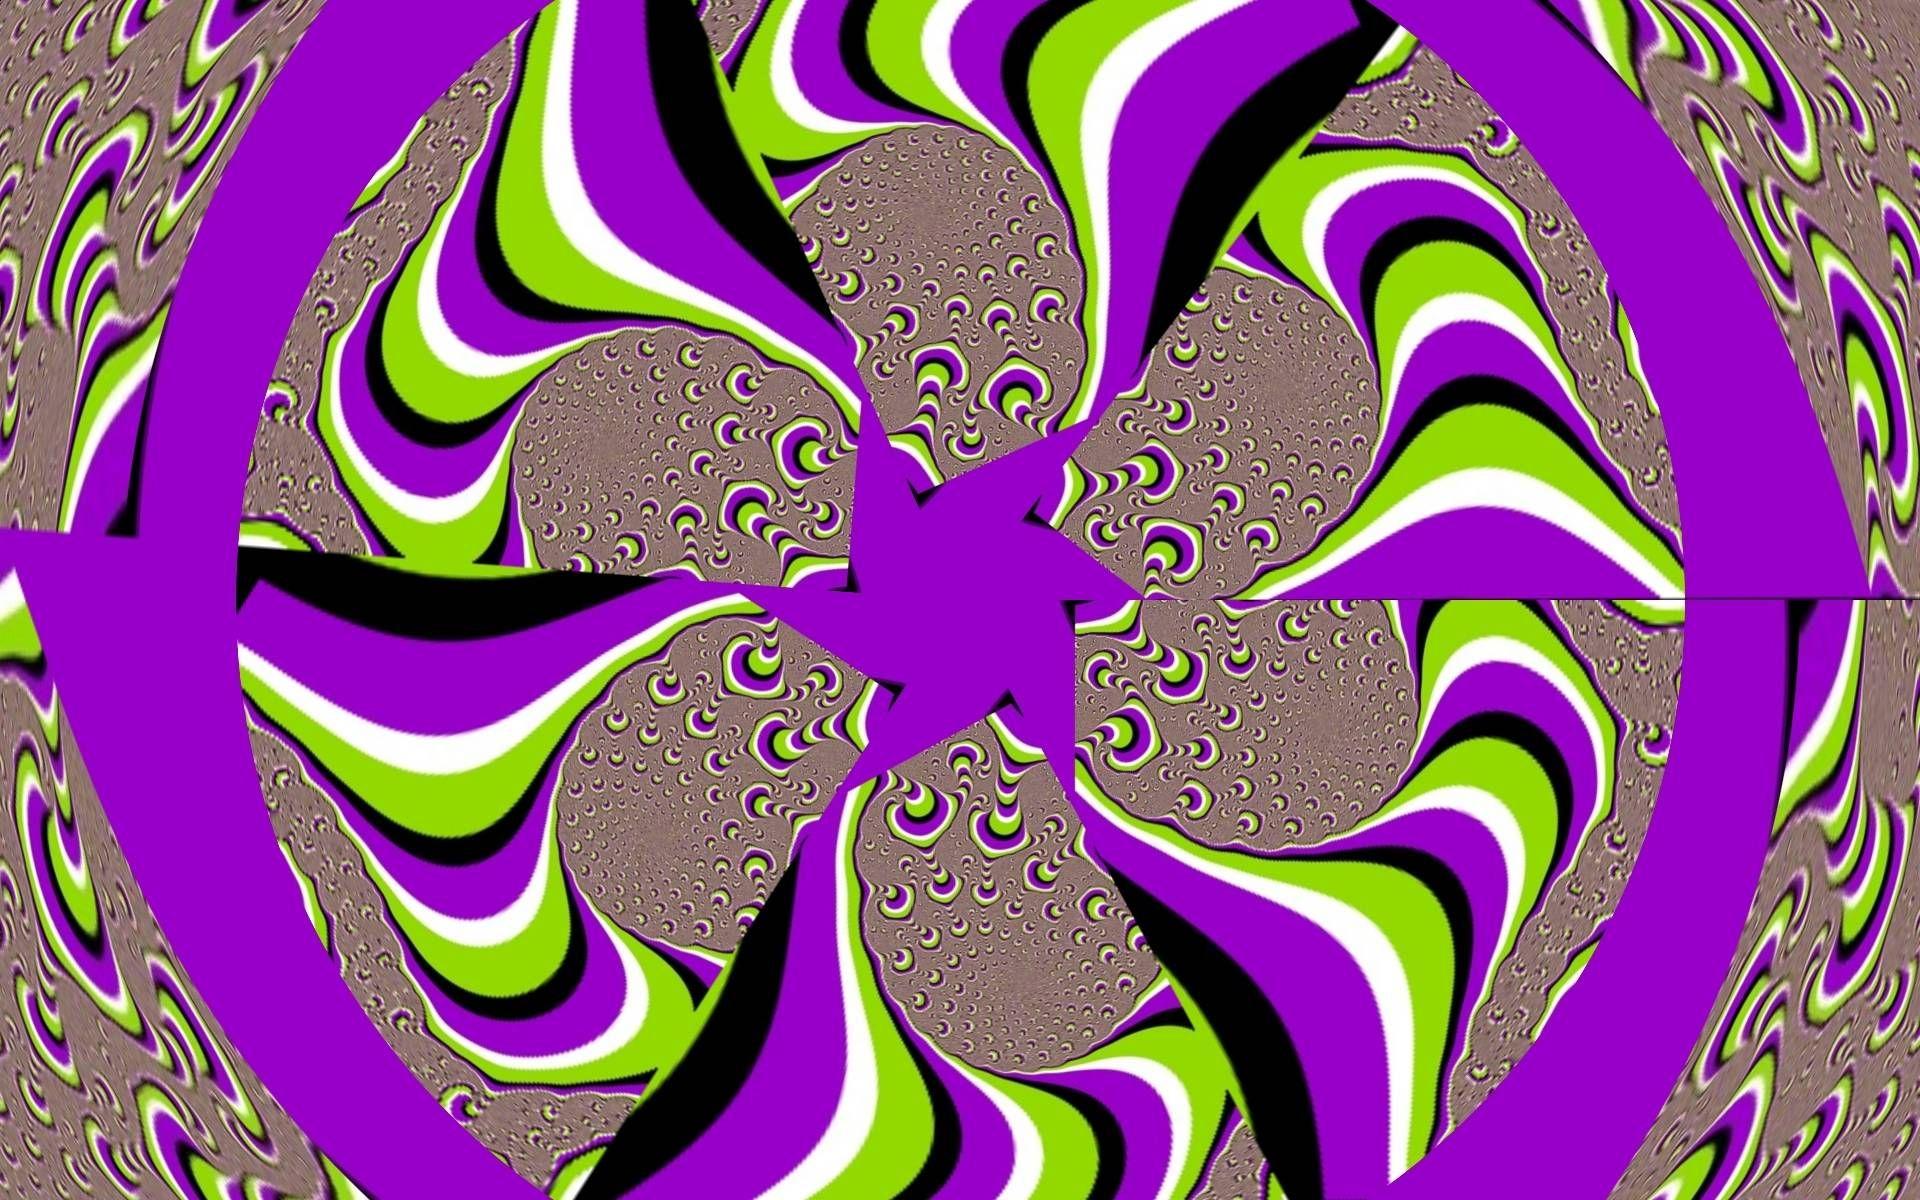 15++ Pc Wallpaper 3d Illusion - Ryan ...